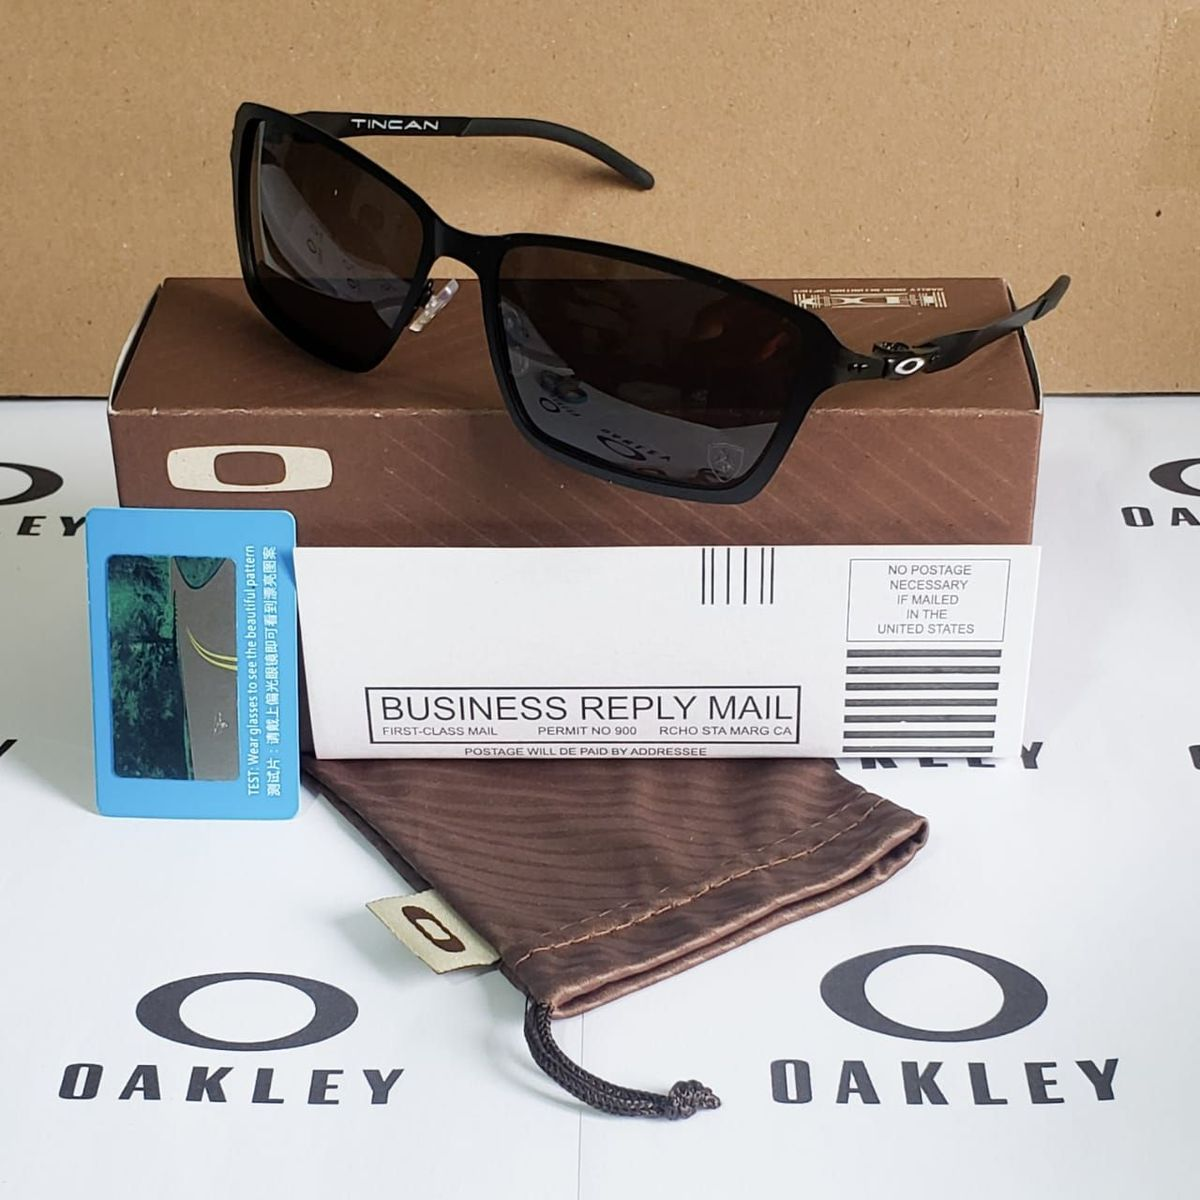 b2f8fc158 Óculos Oakley Tincan Ferrari Promoção!!! | Óculos Masculino Oakley ...